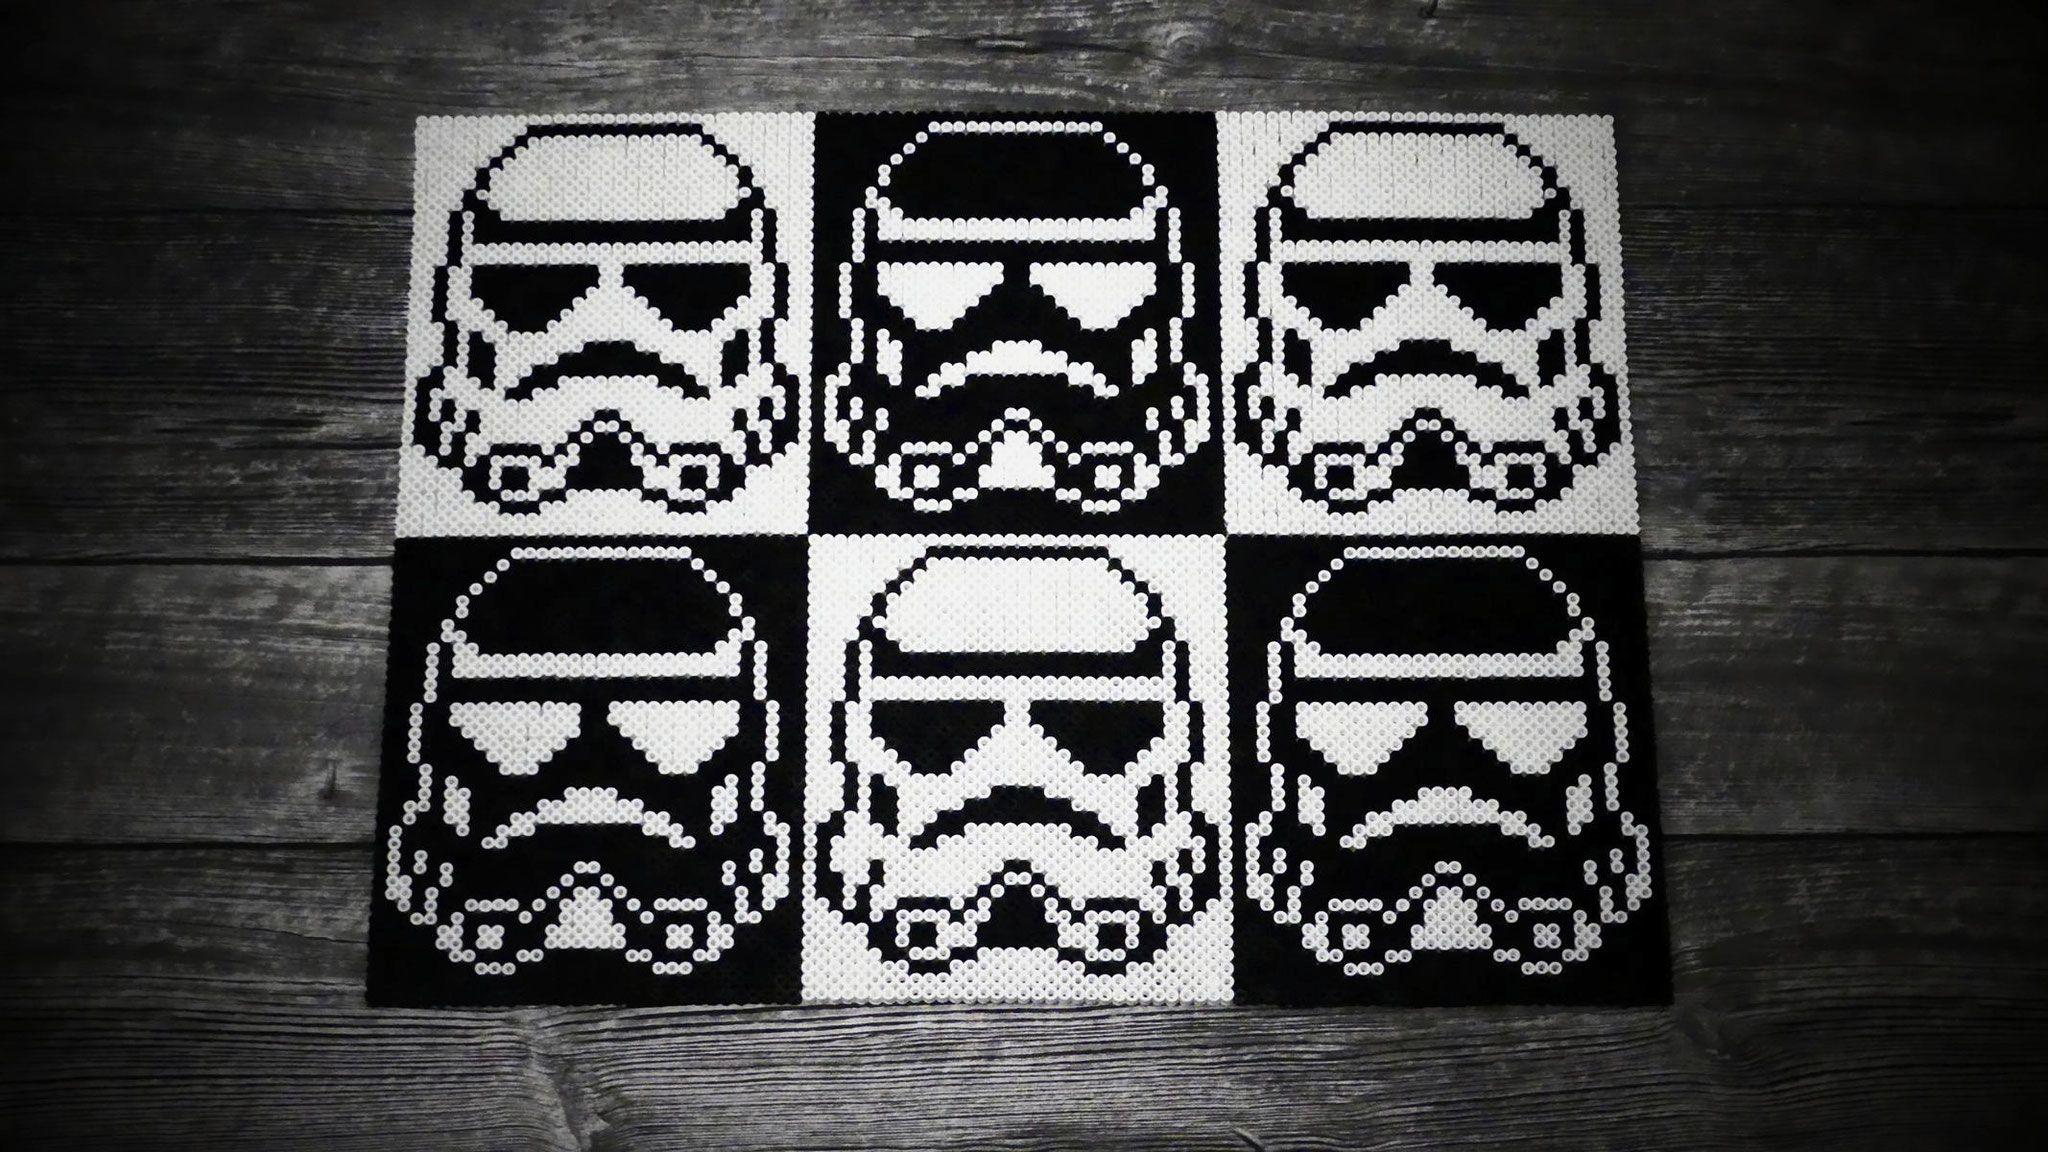 Star Wars Original Diseno Darth Vader Star Wars Asalto Dia R2 D2